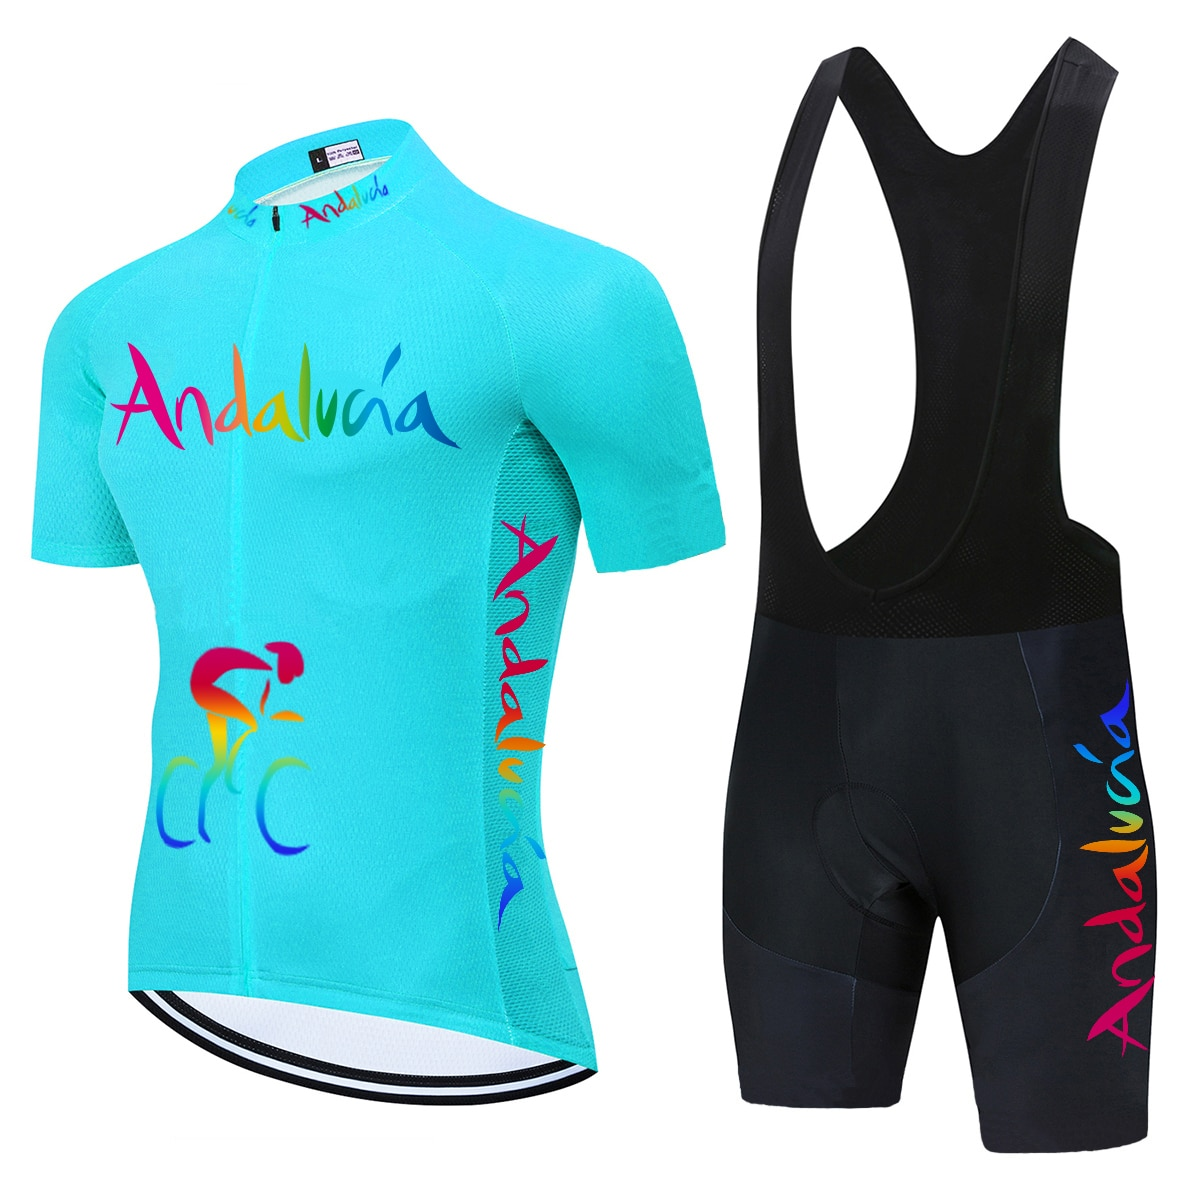 Andalucía Pro equipo Ciclismo Jersey 2021 Ropa MTB Ropa de Ciclismo Ropa...